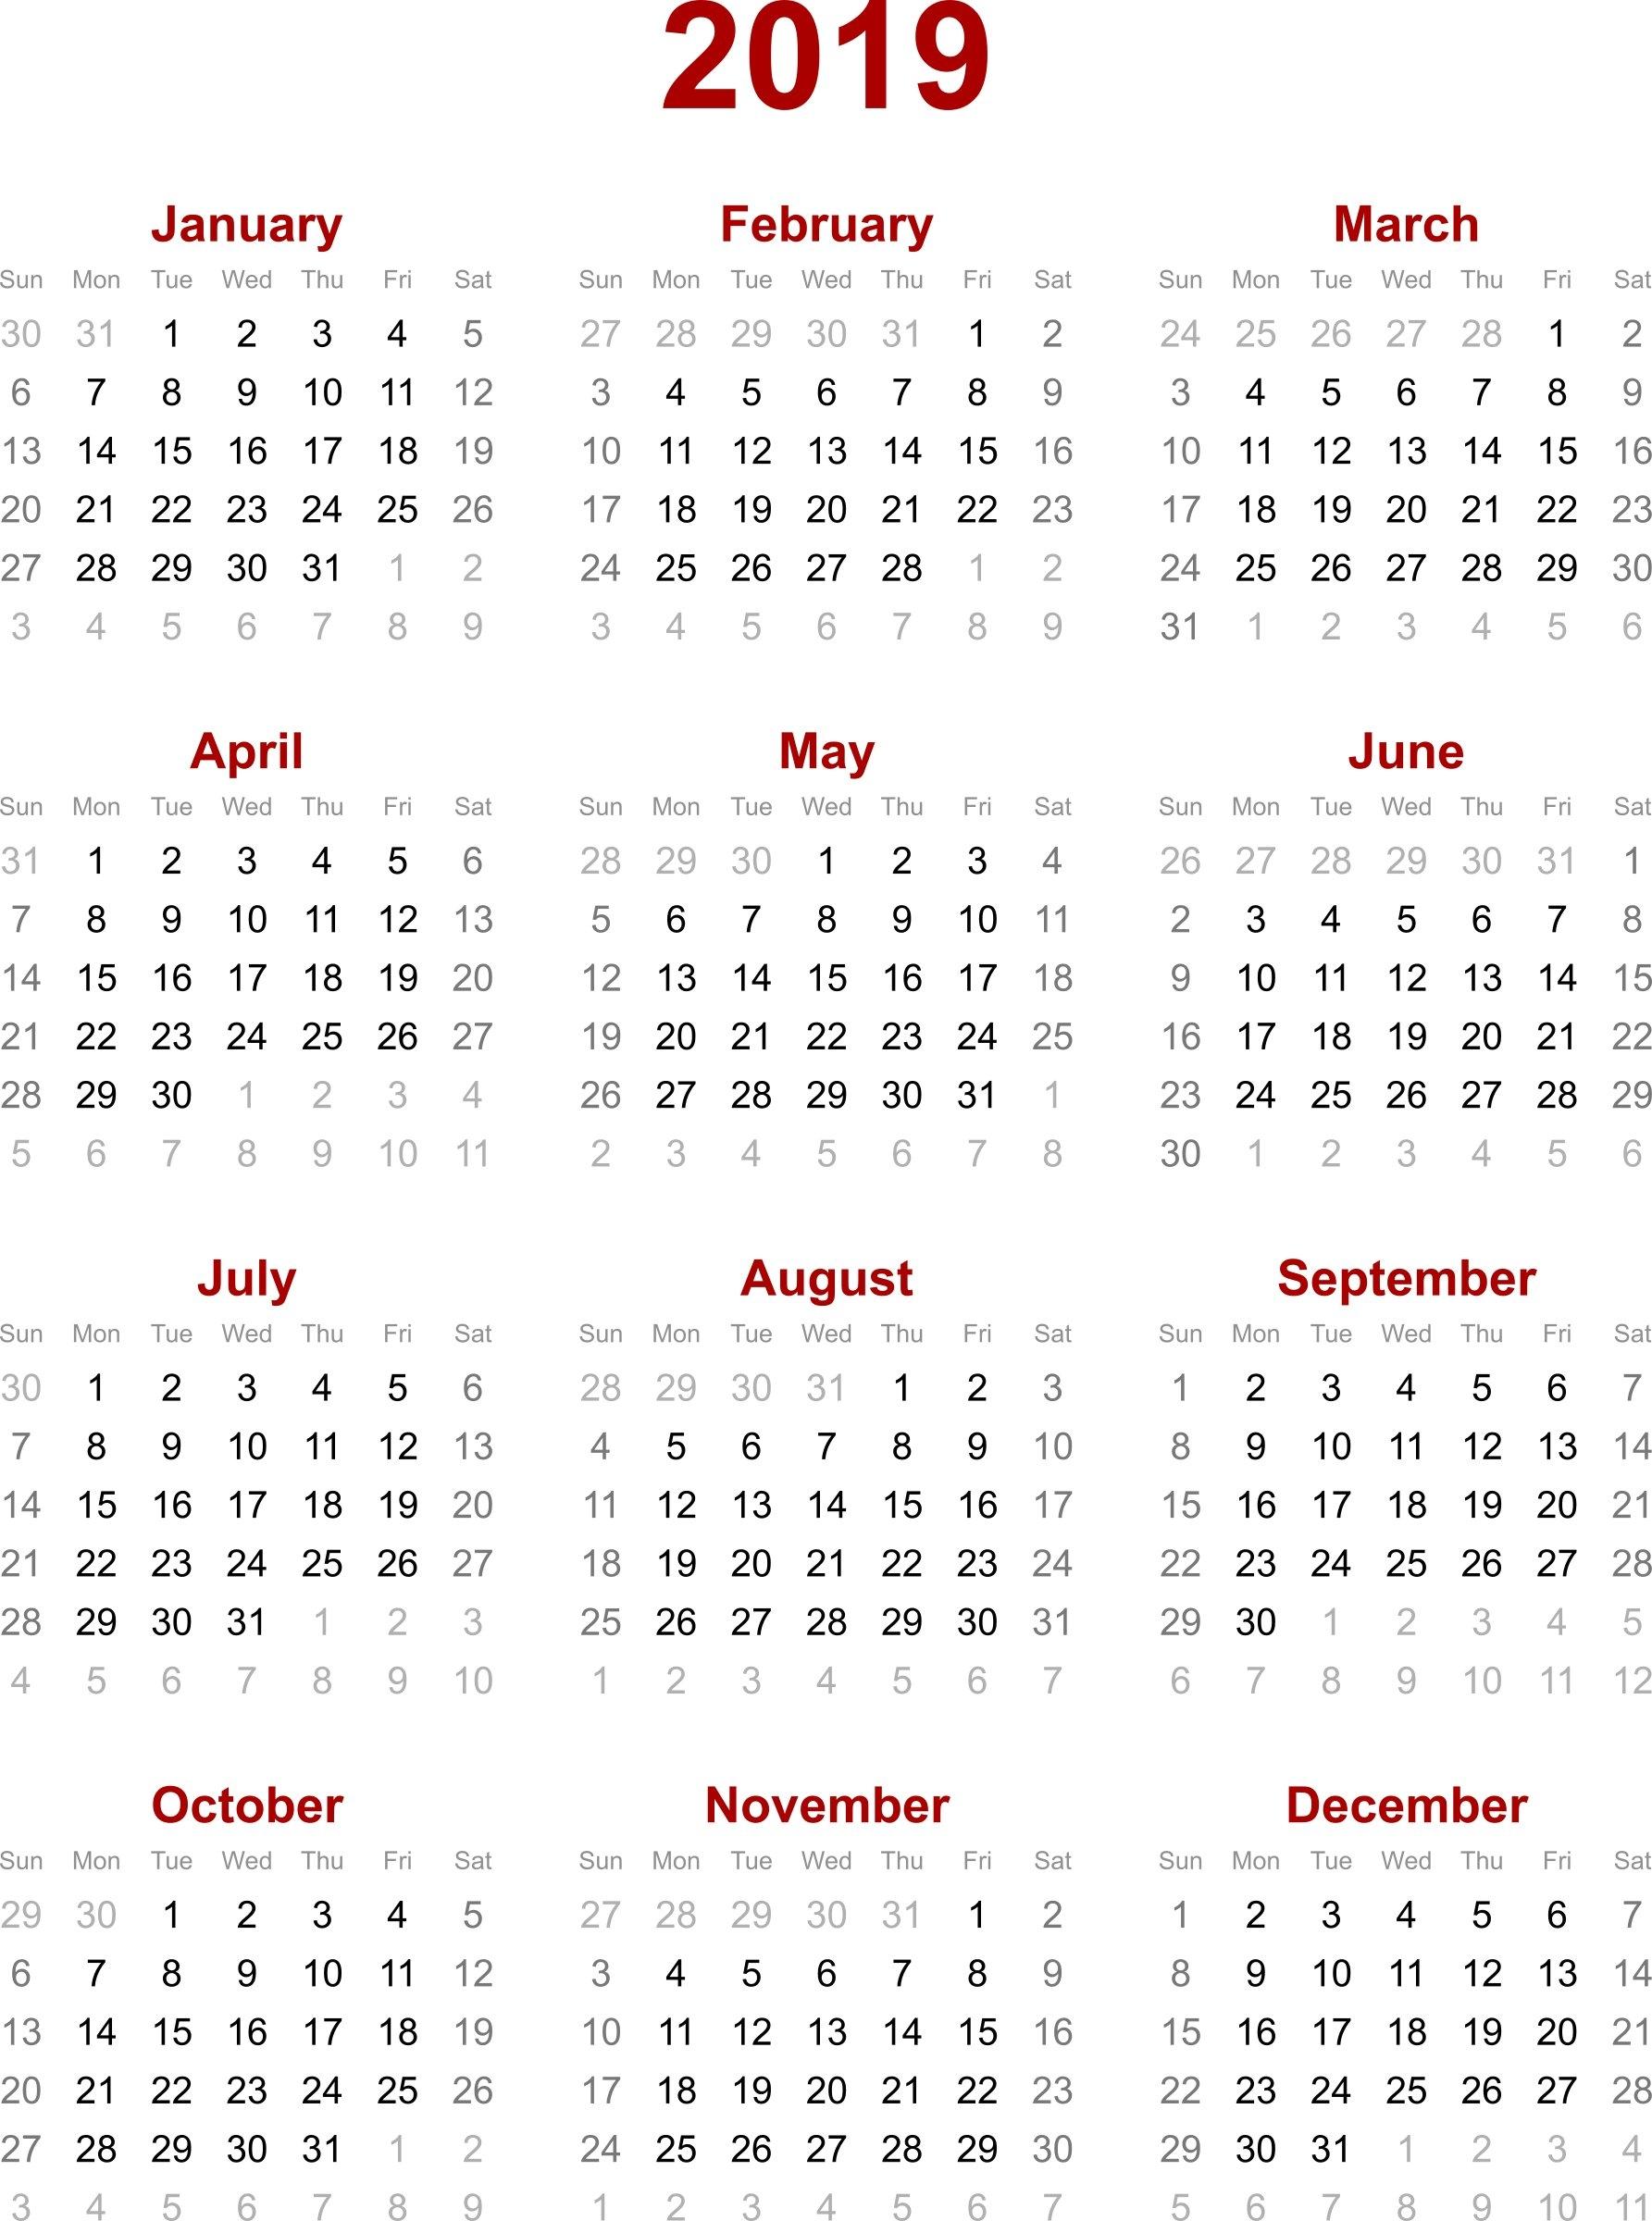 2019 Calendar Printable - Printable Calendar & Birthday Cards Calendar 2019 Annual